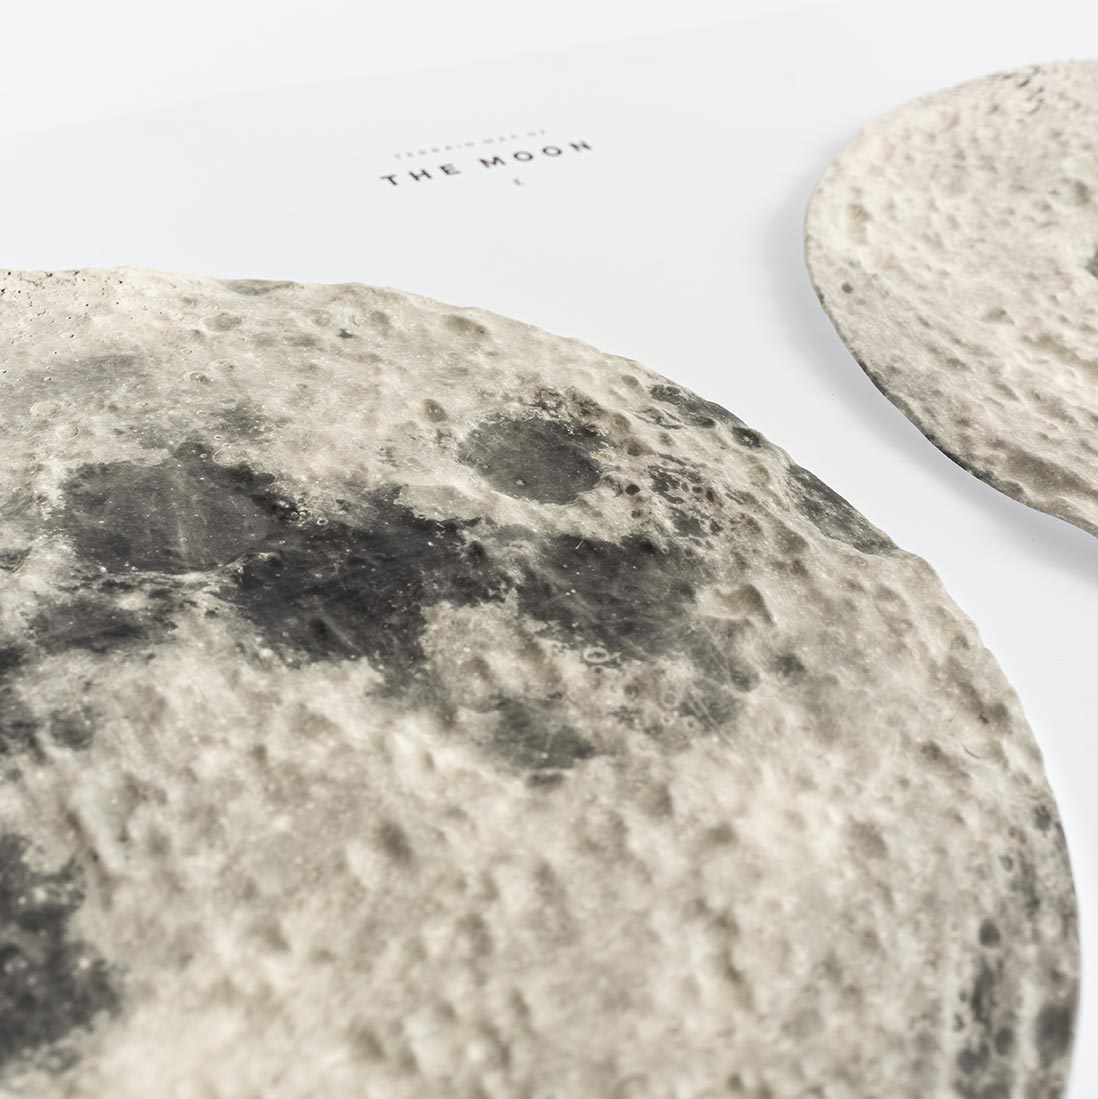 Terrain Map of Moon Details